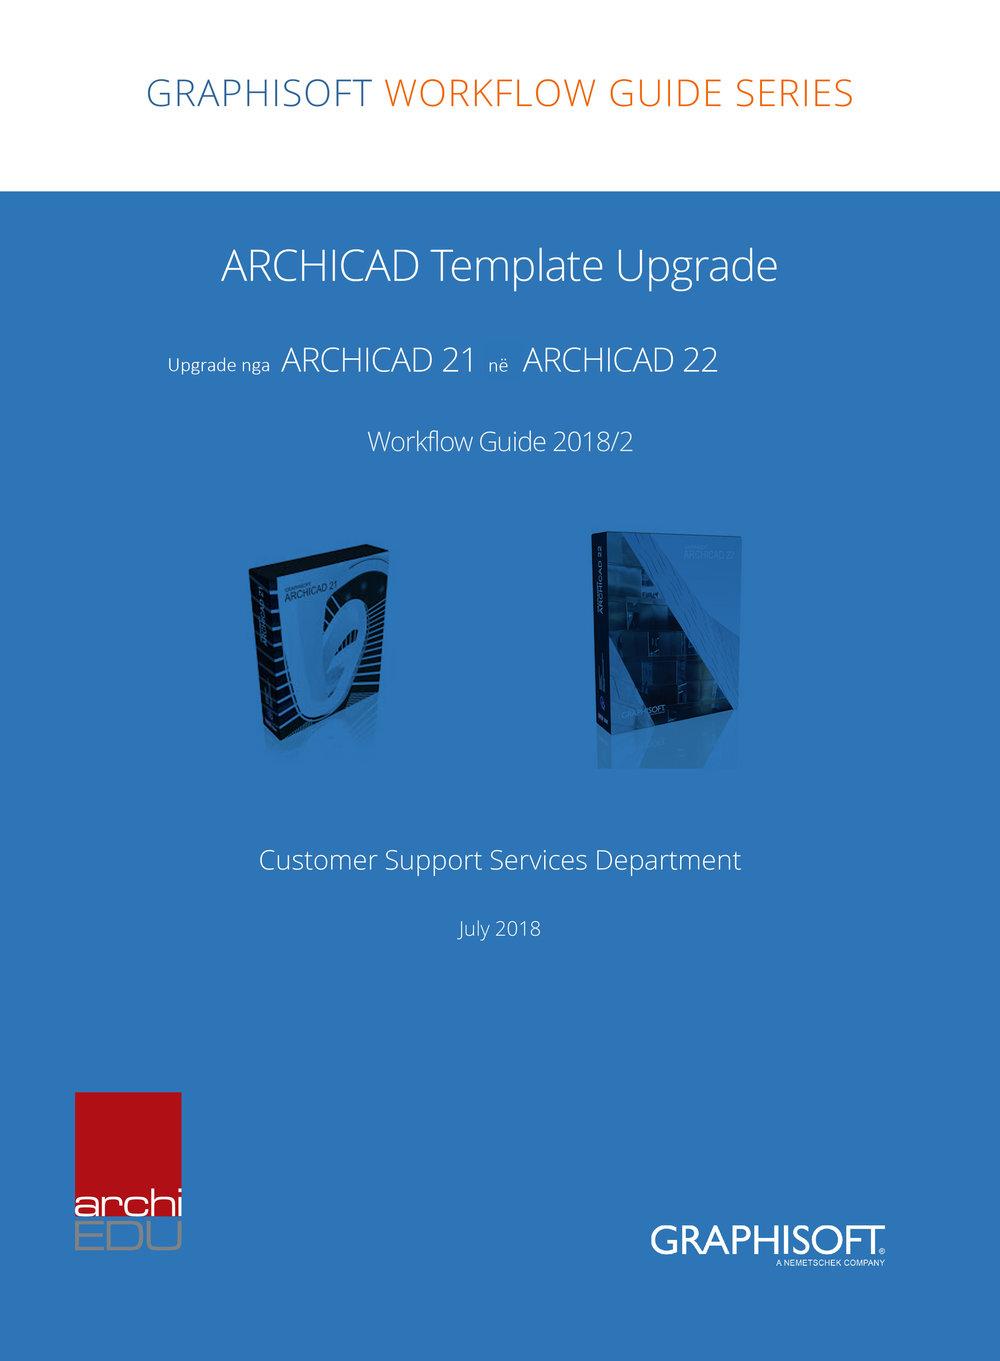 GWG_ARCHICAD-Template-Upgrade.jpg